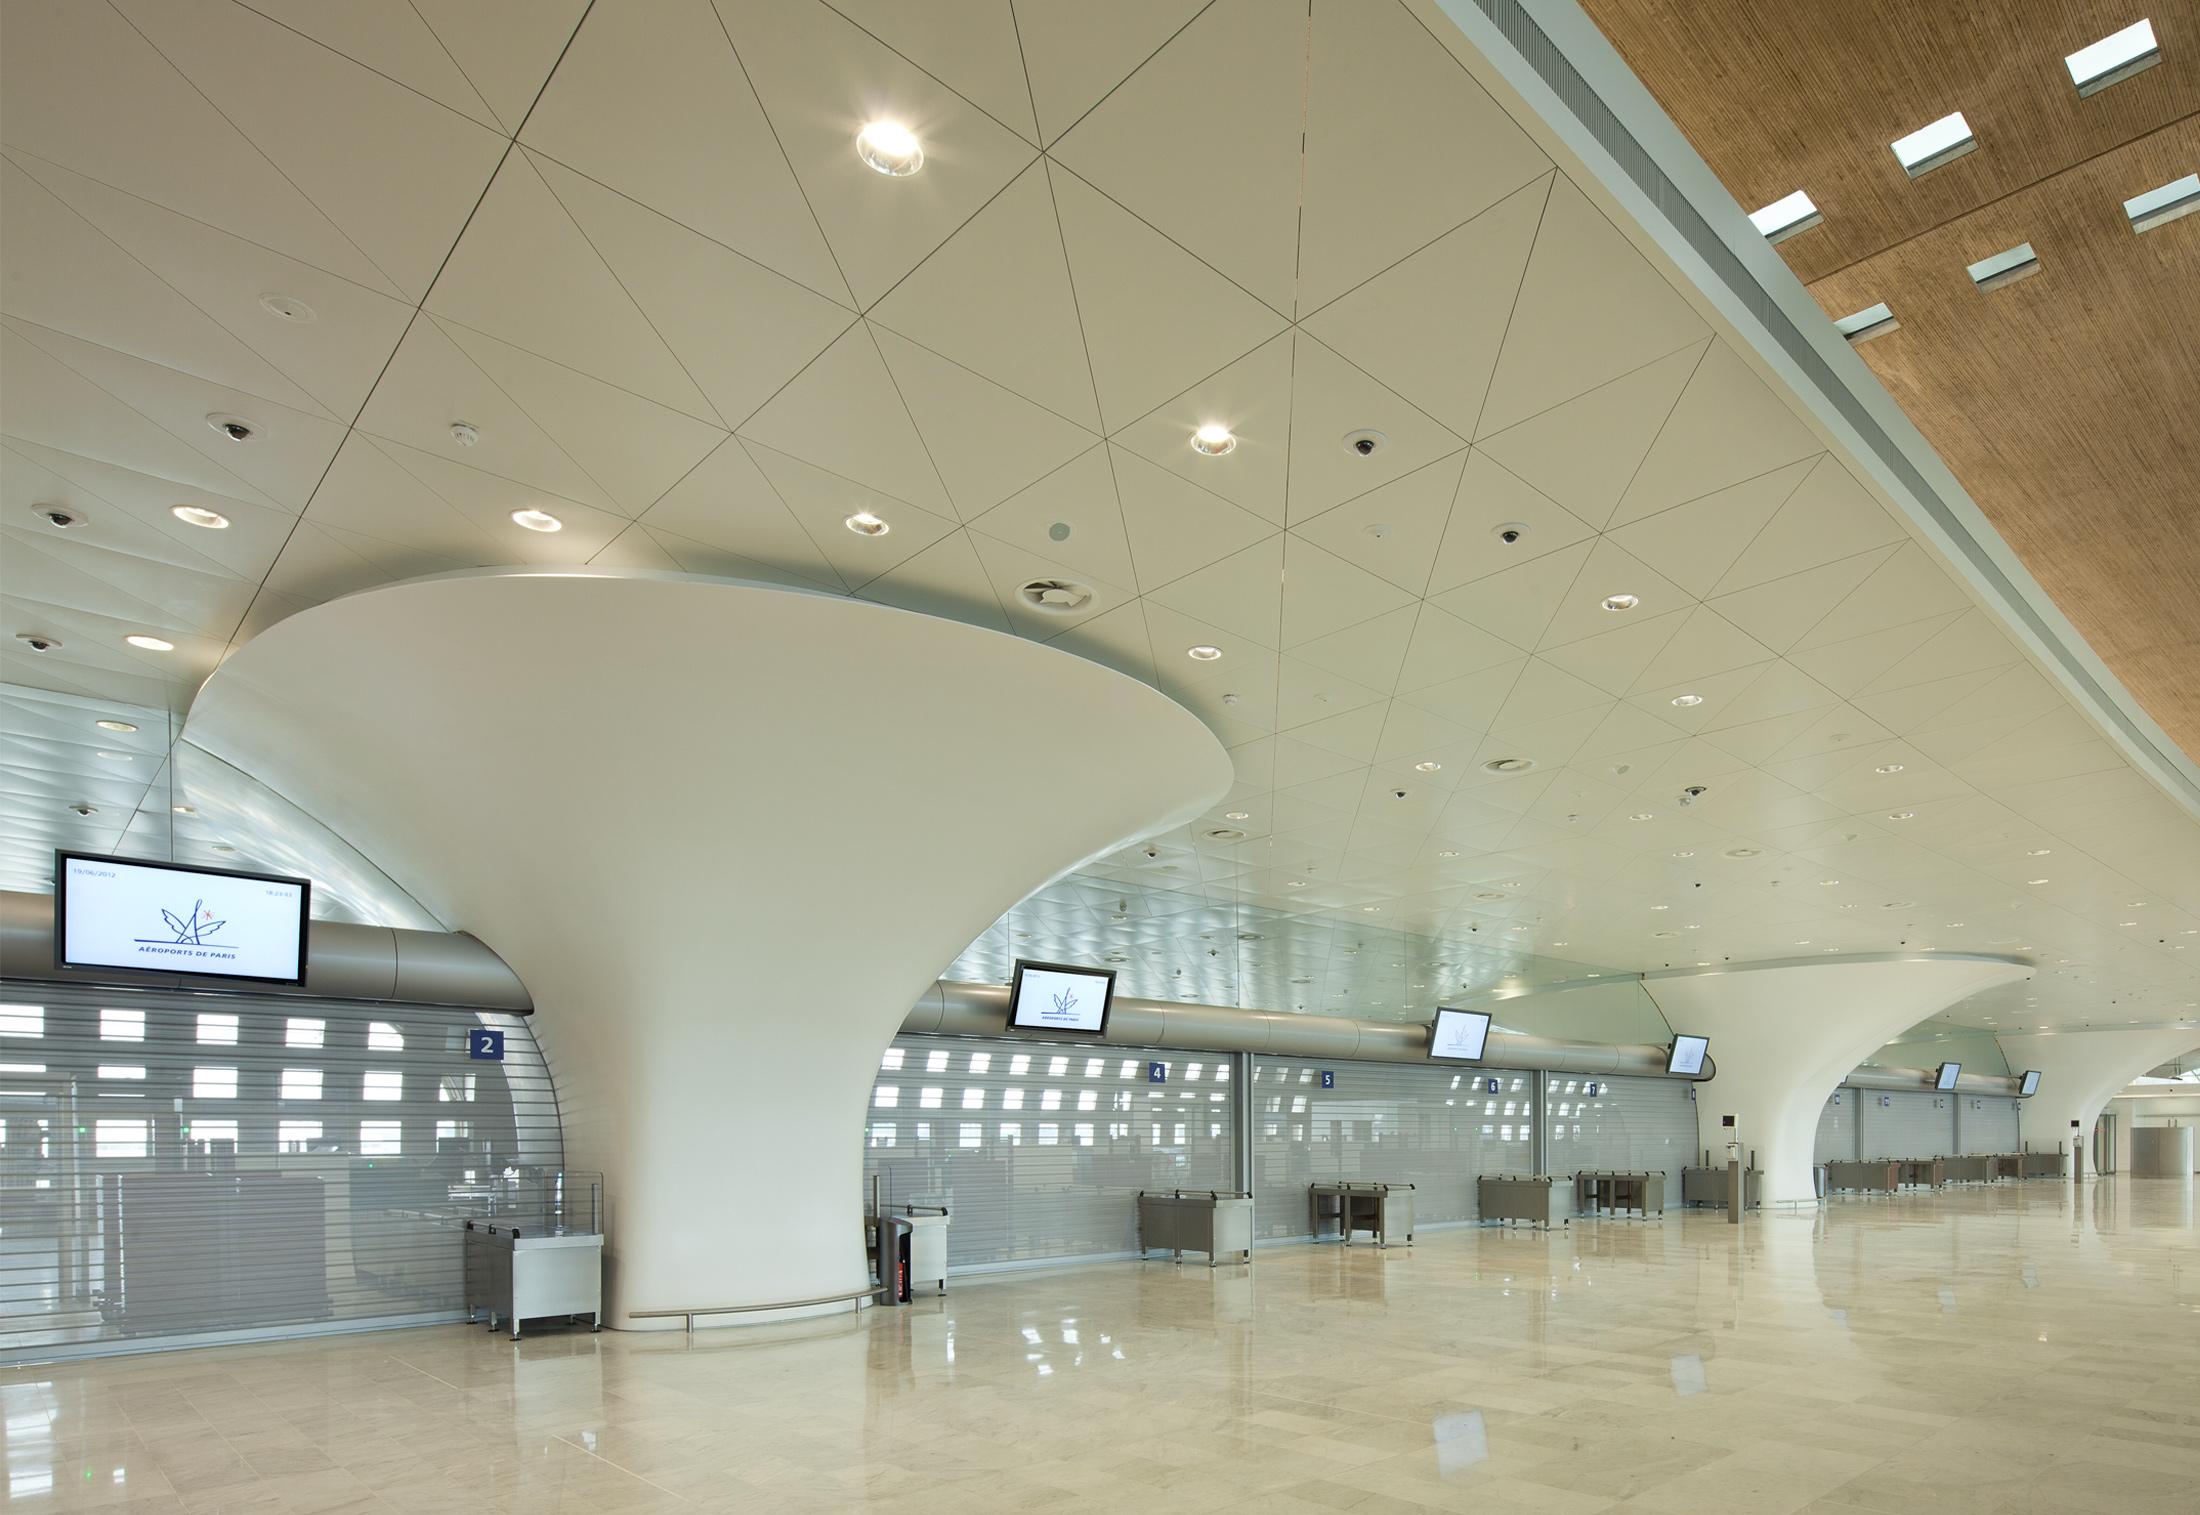 Clads Terminal 2f Charles De Gaulle Airport Paris By Hi Macs Relay 3 Cdg